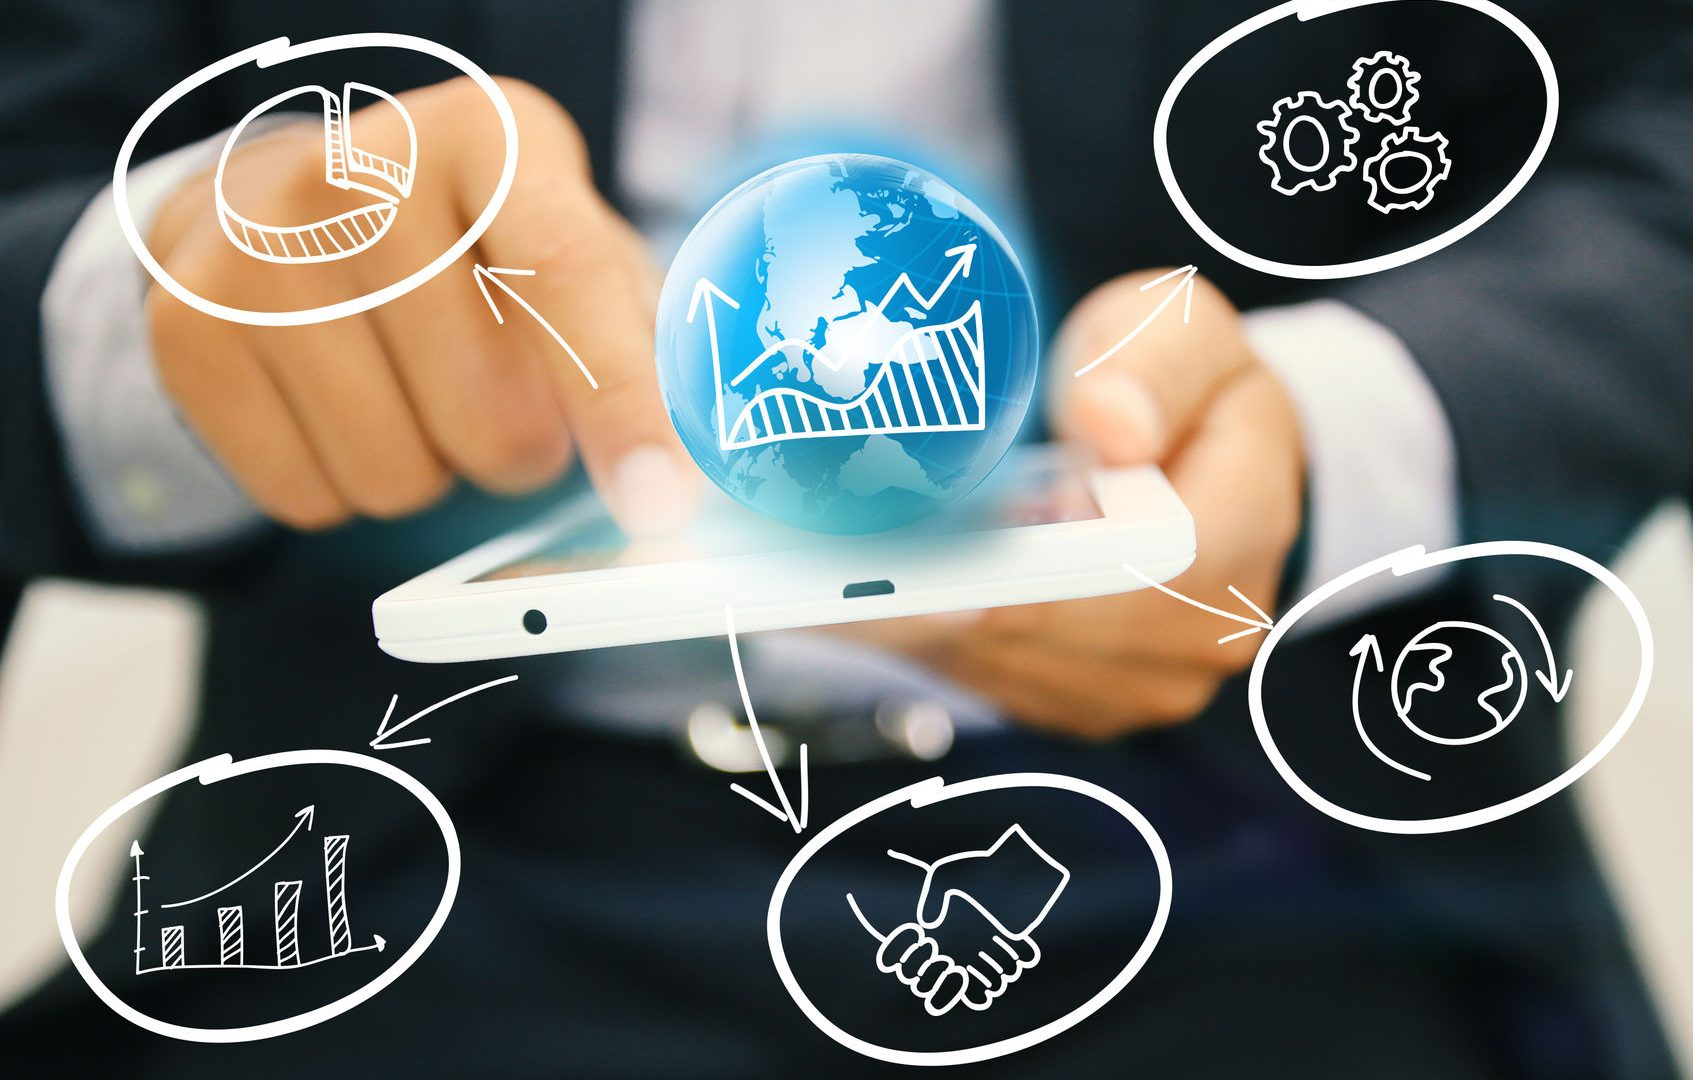 Marketing online, una herramienta para vender, crecer e innovar